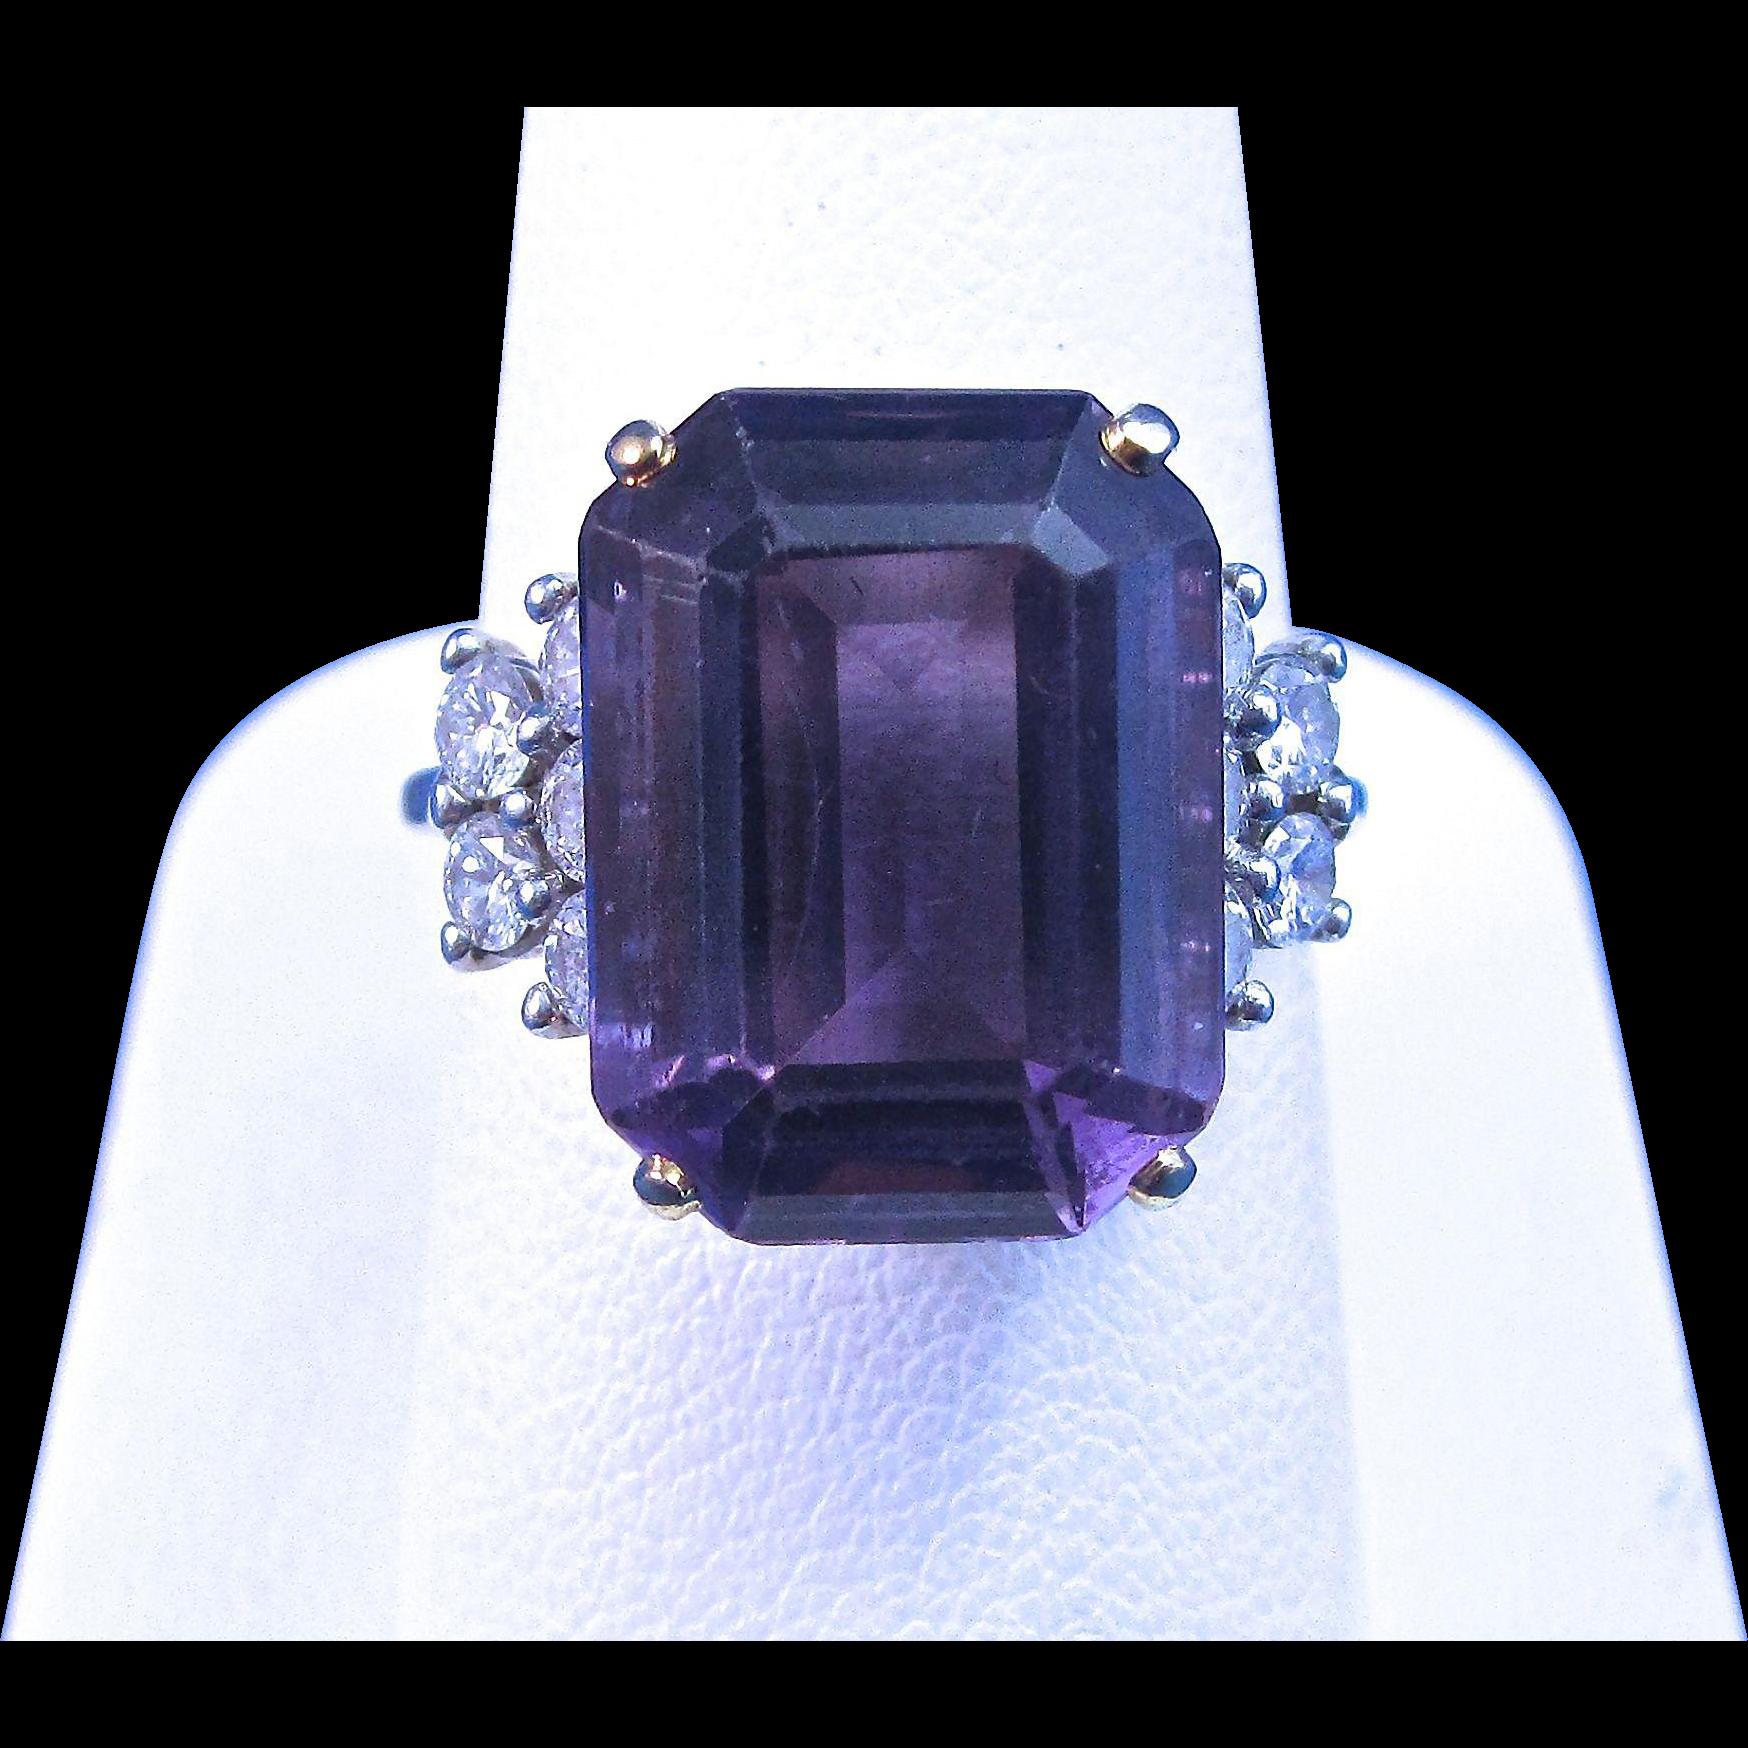 Vintage Estate 1960's Amethyst & Diamond Engagement Wedding Birthstone Anniversary Ring 18K White Yellow Gold